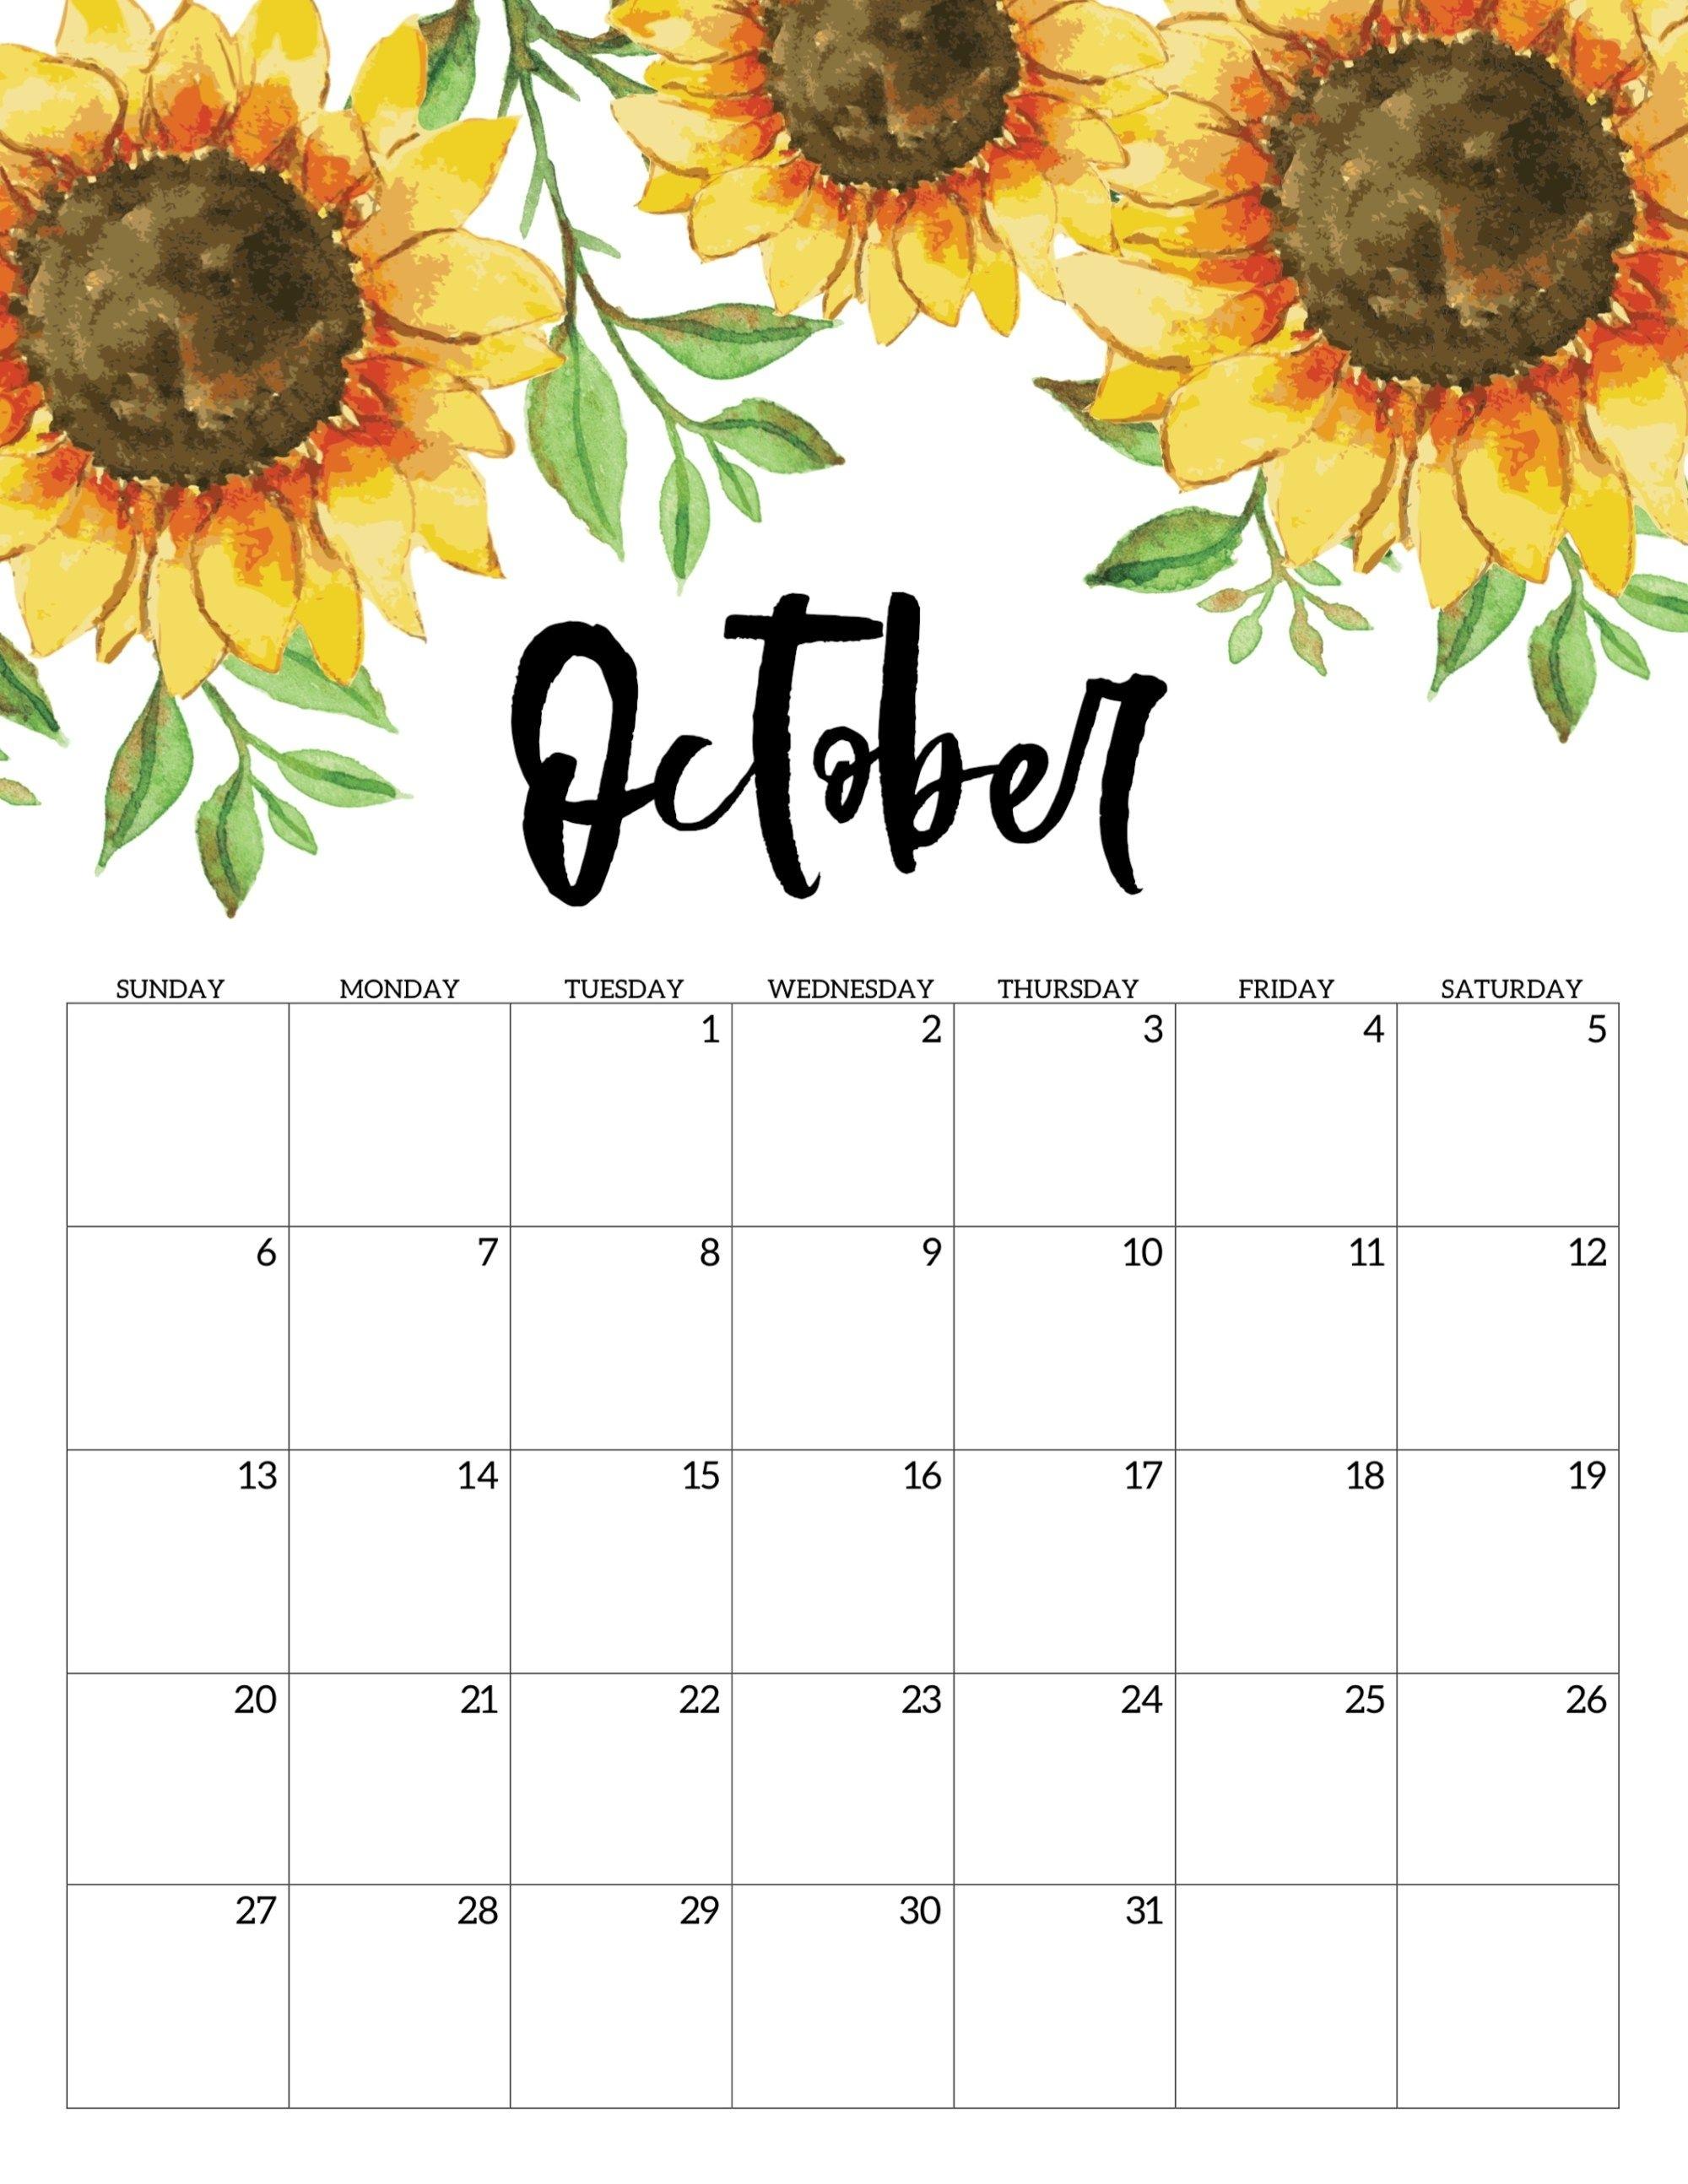 Free Printable Calendar 2019 - Floral | Calendar 2019